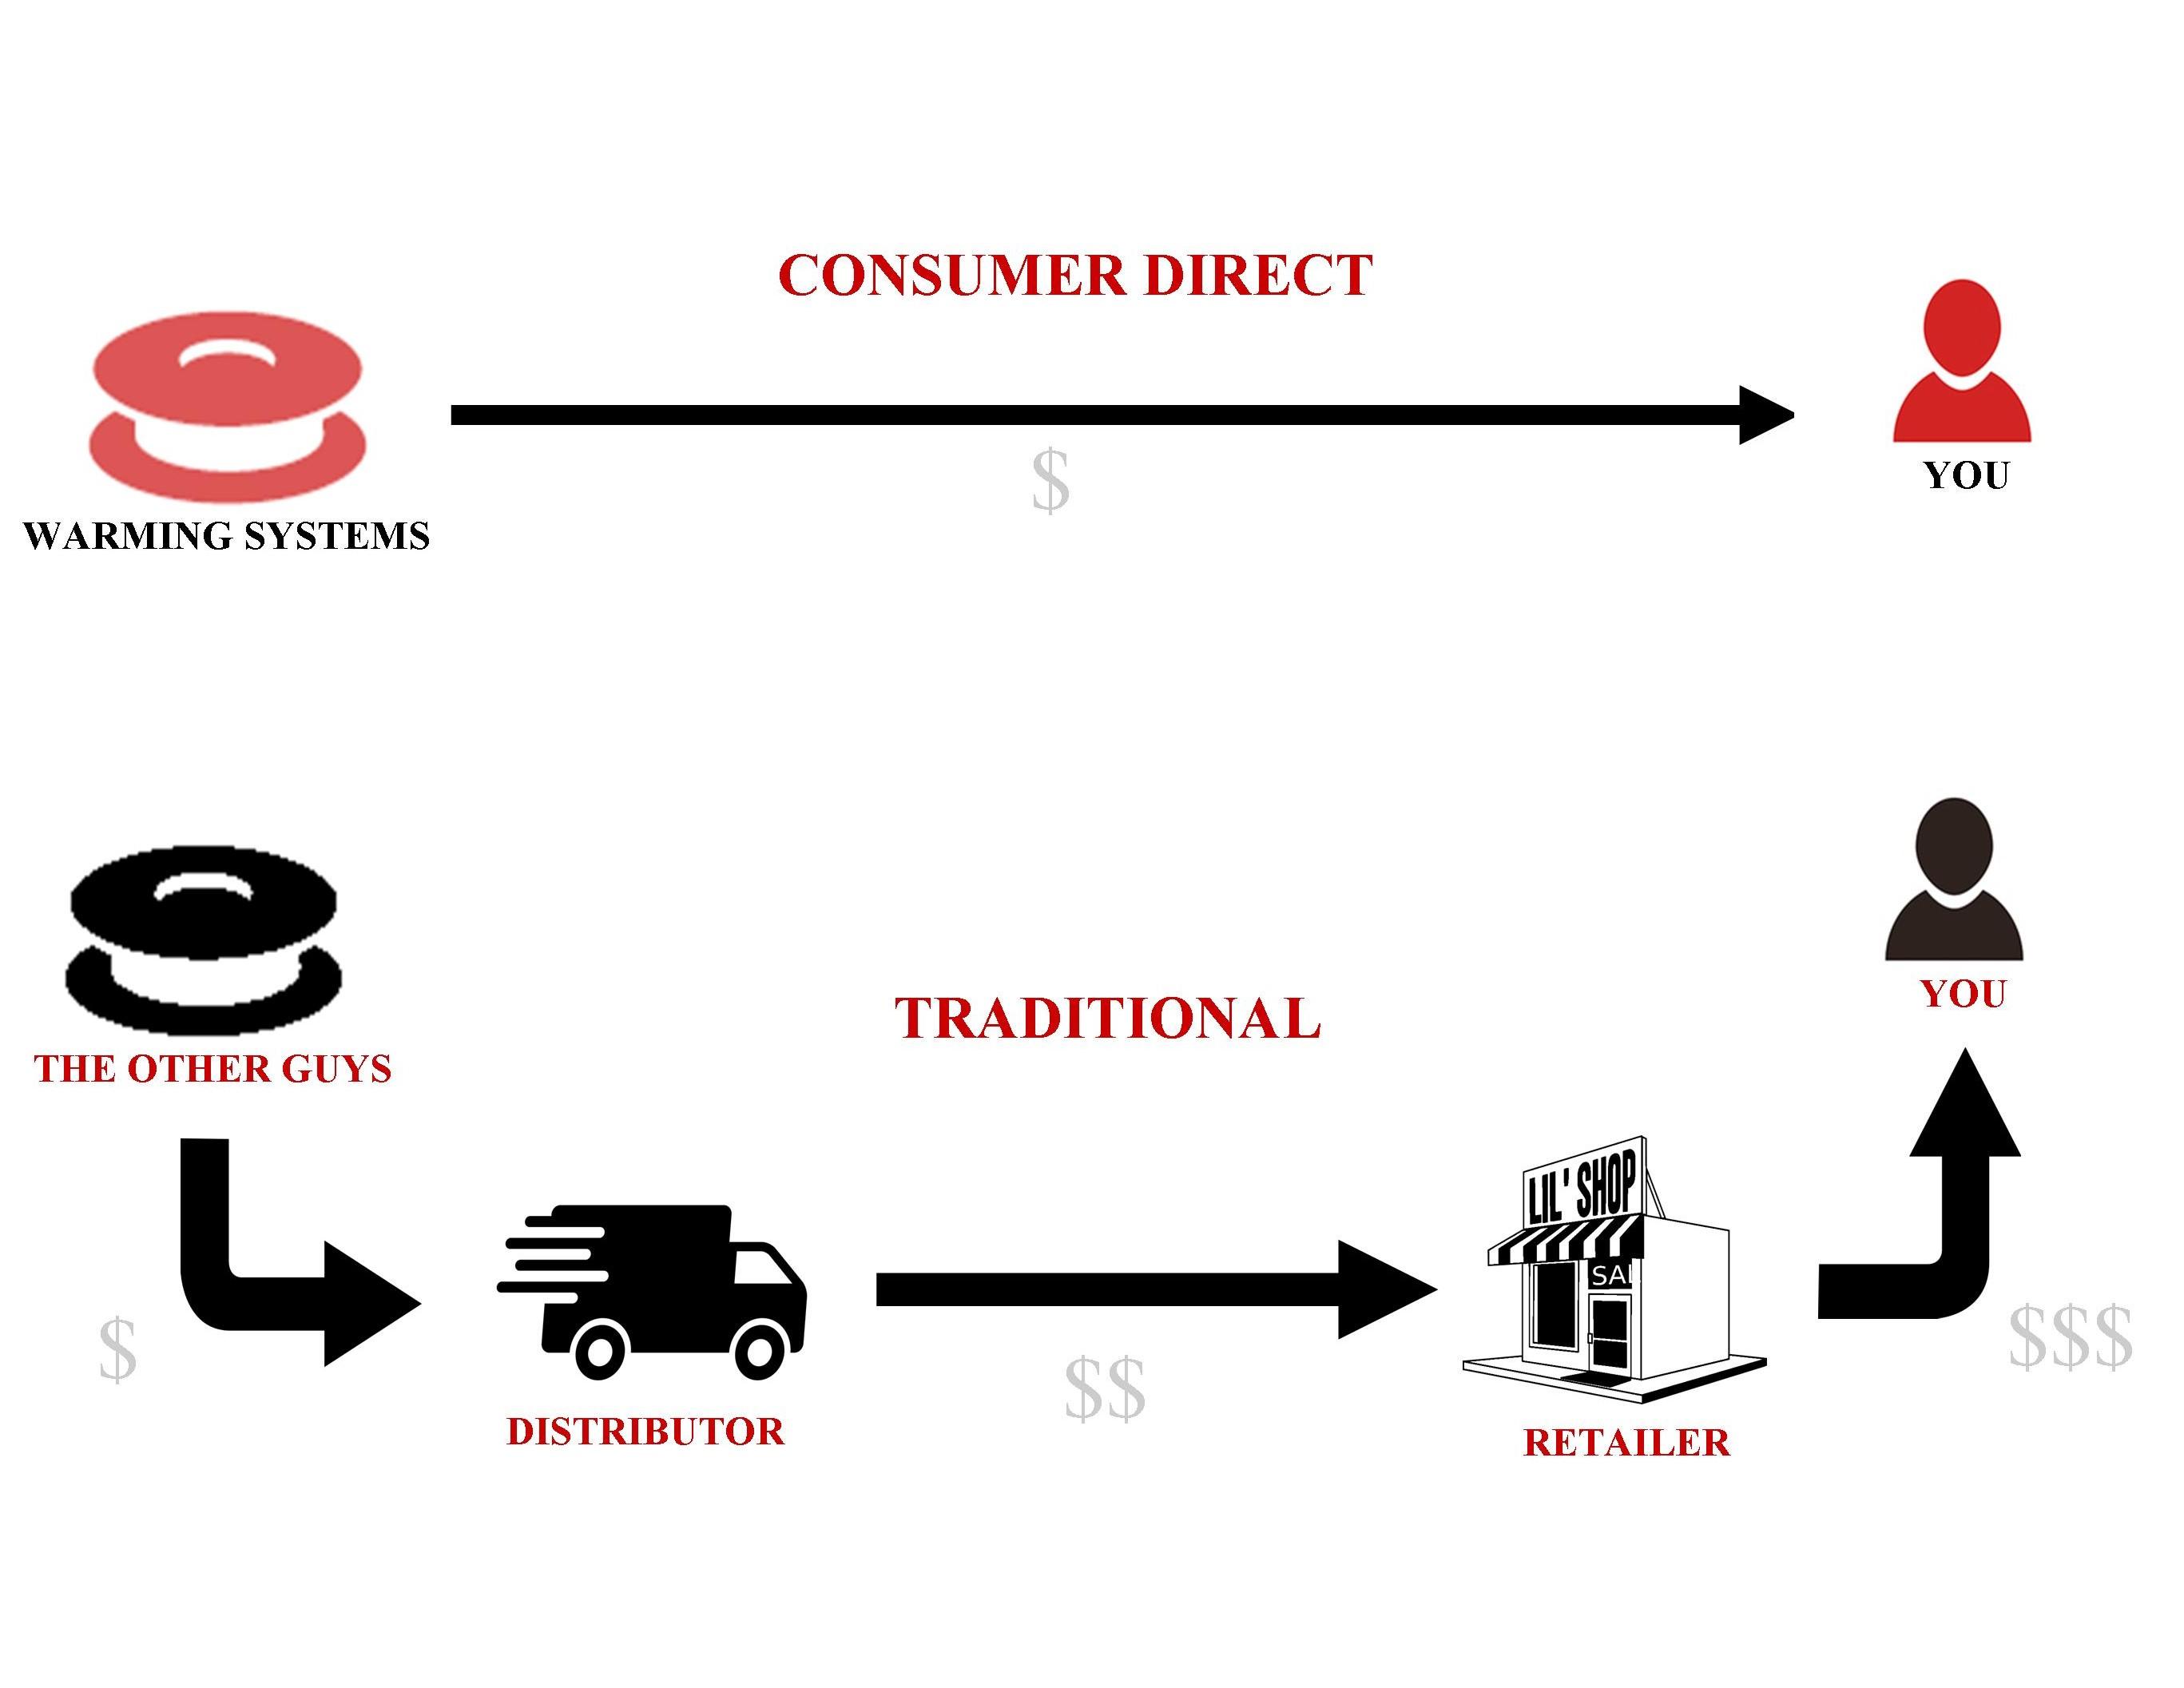 consumer-direct-image-3.jpg